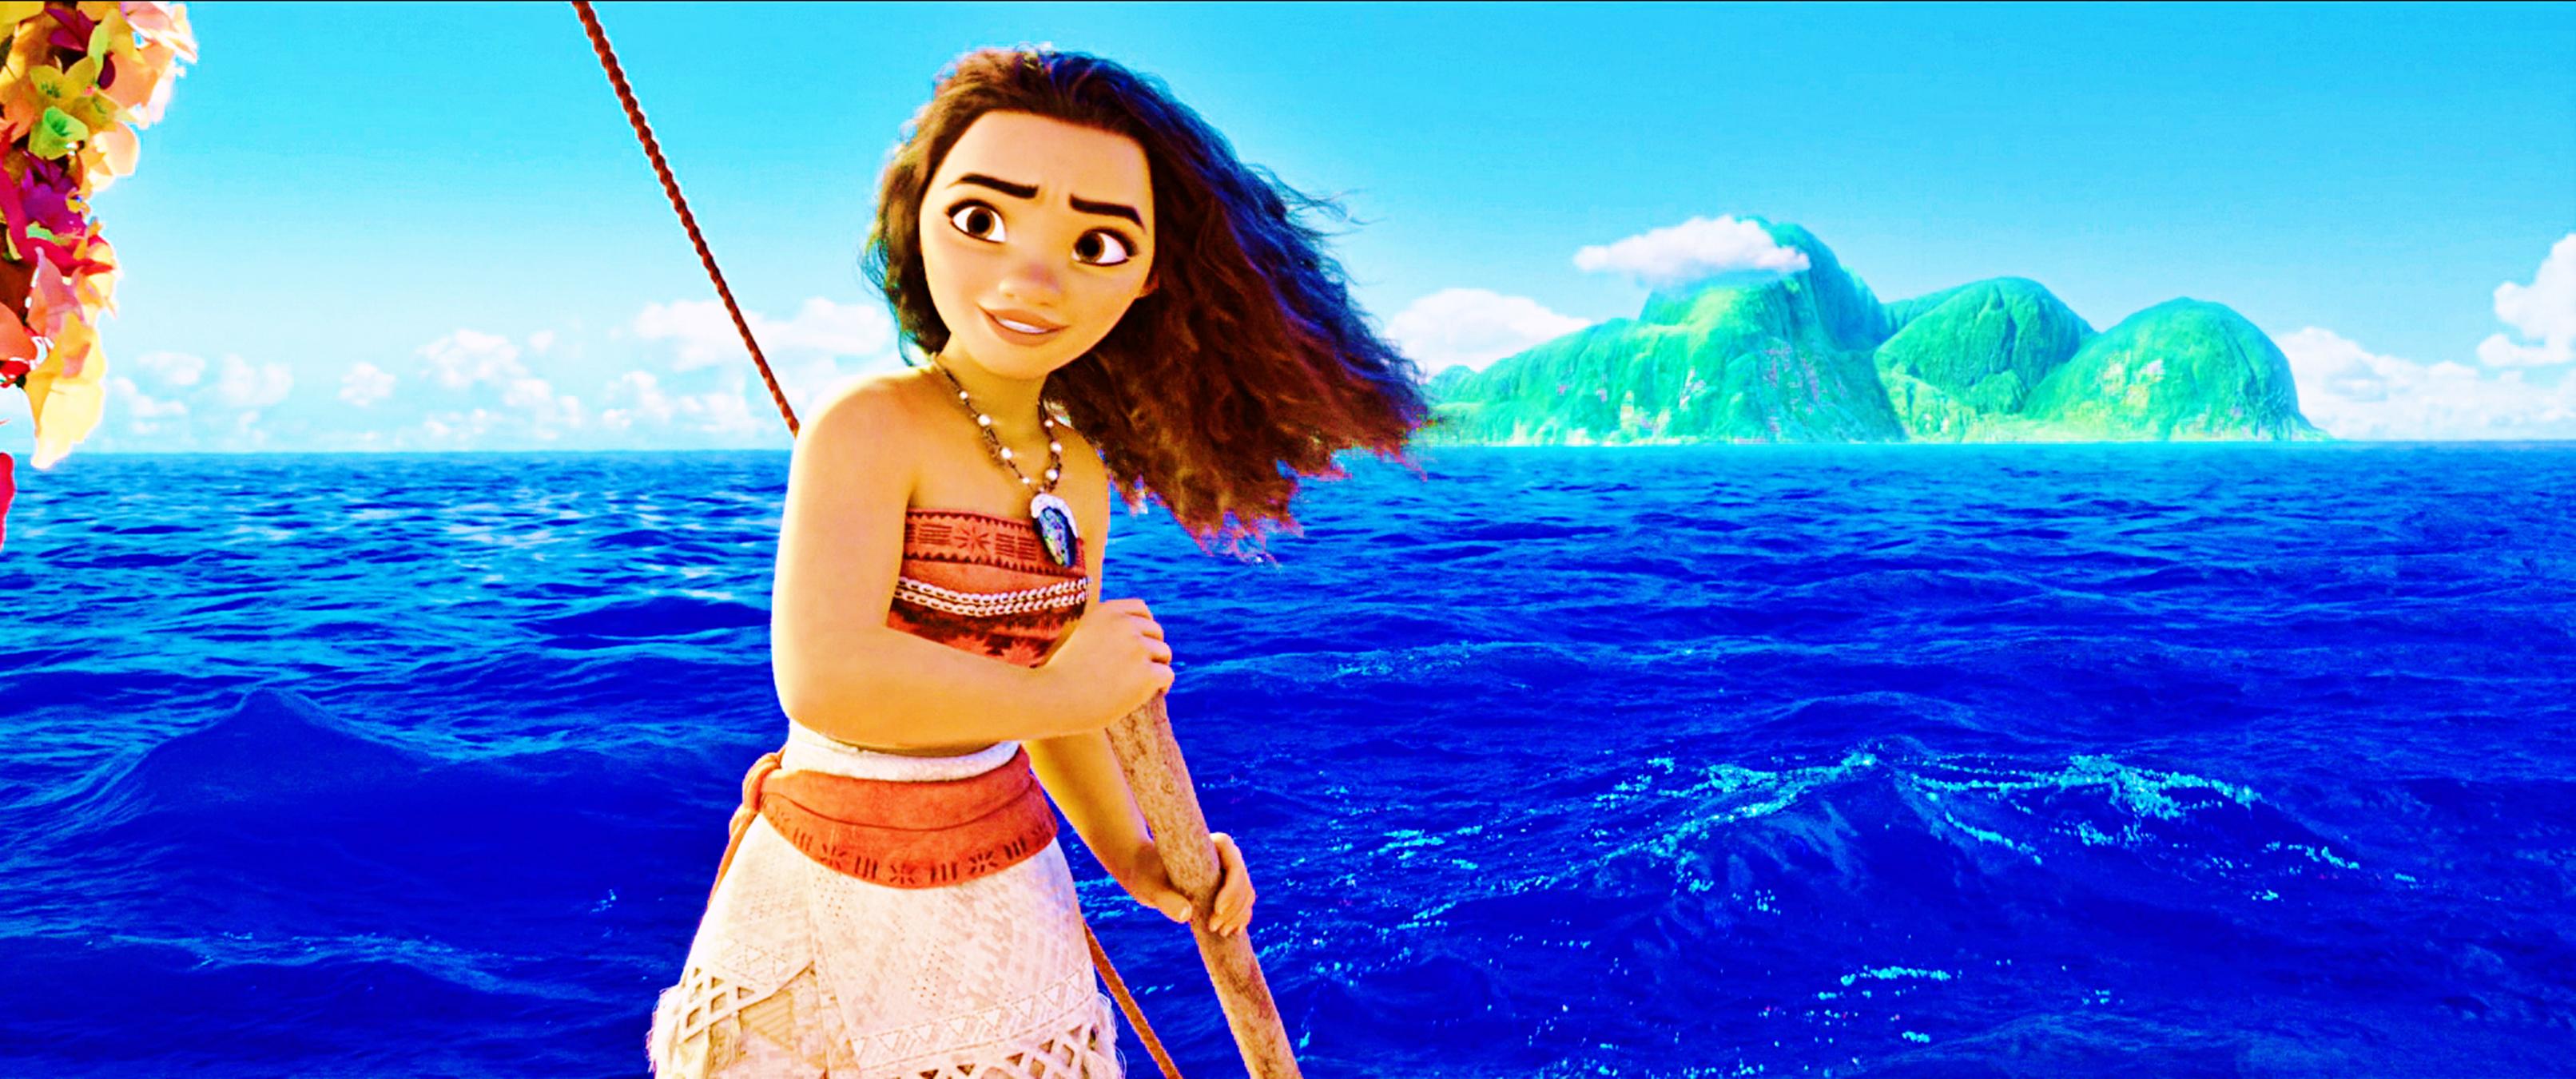 Walt Disney Screencaps – Moana - Walt Disney Characters